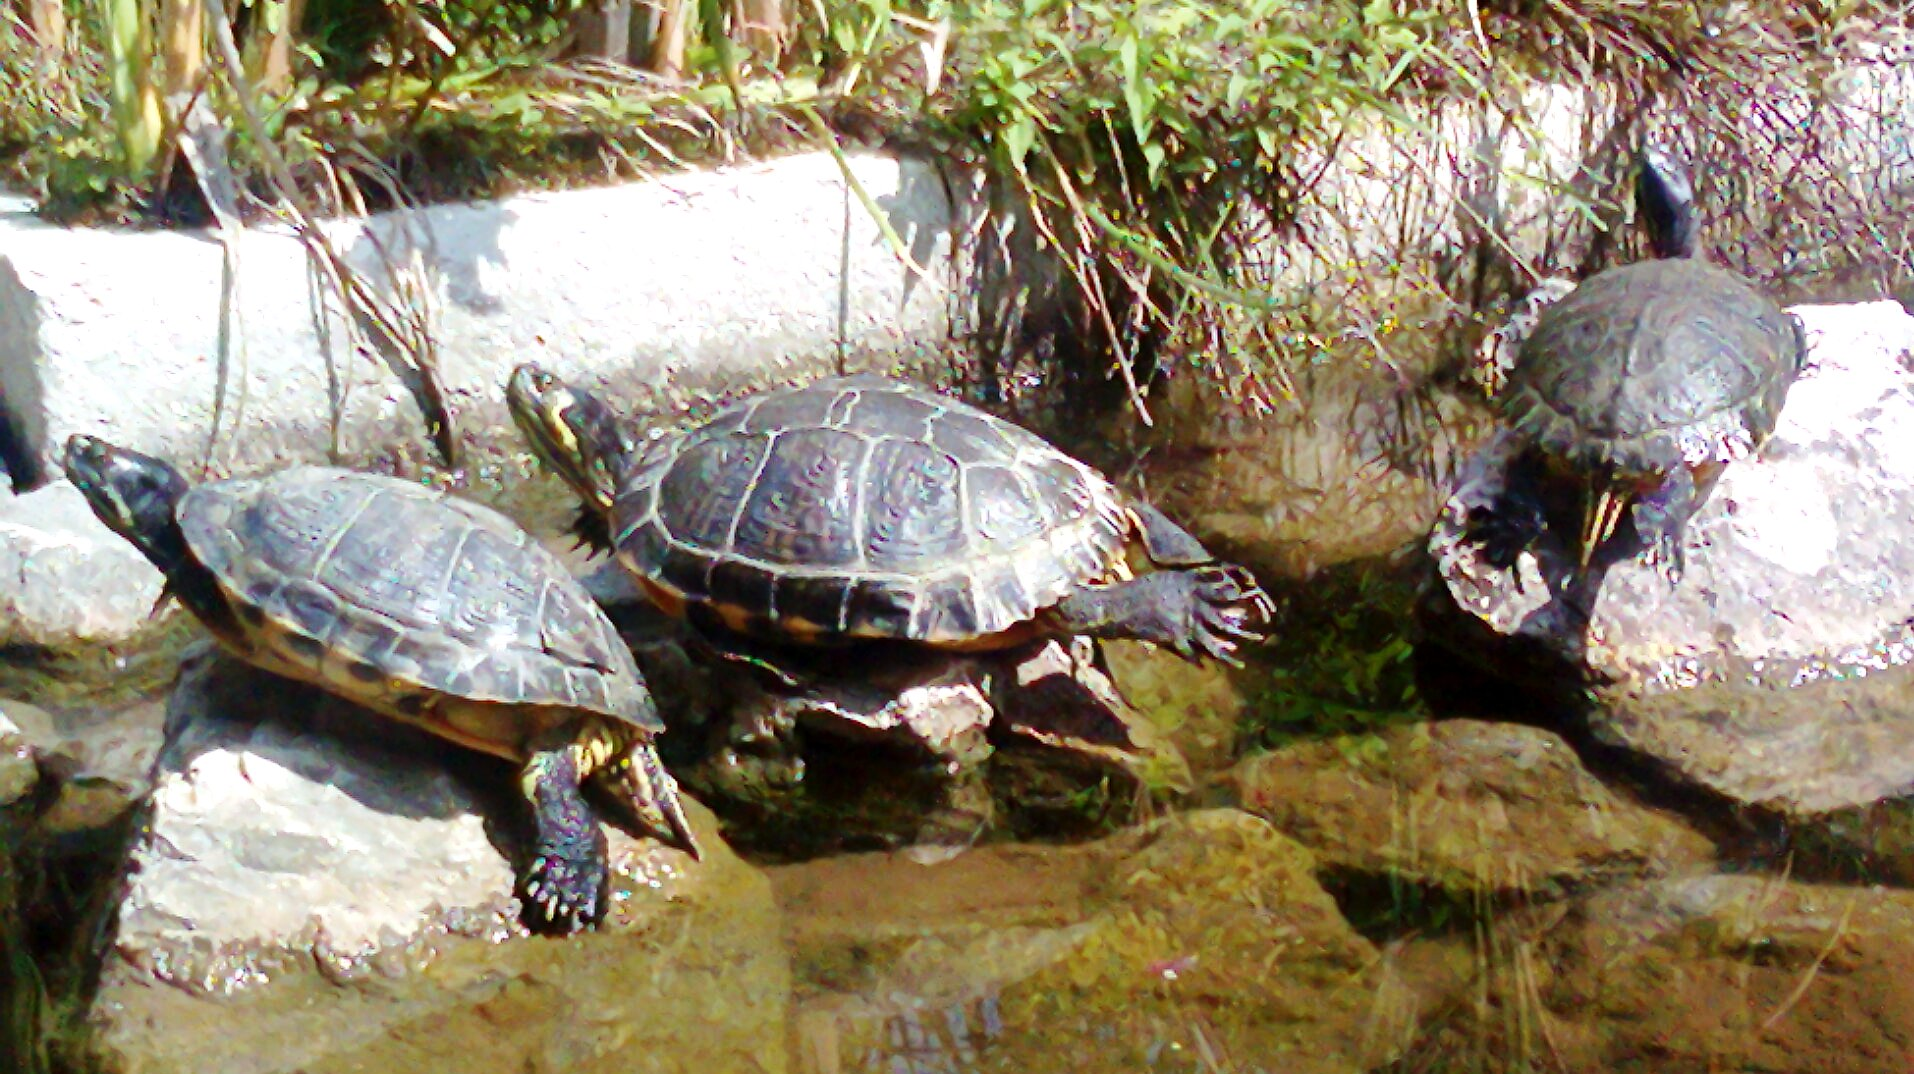 Storie di tartarughe e altri strani amici for Laghetti per tartarughe usati